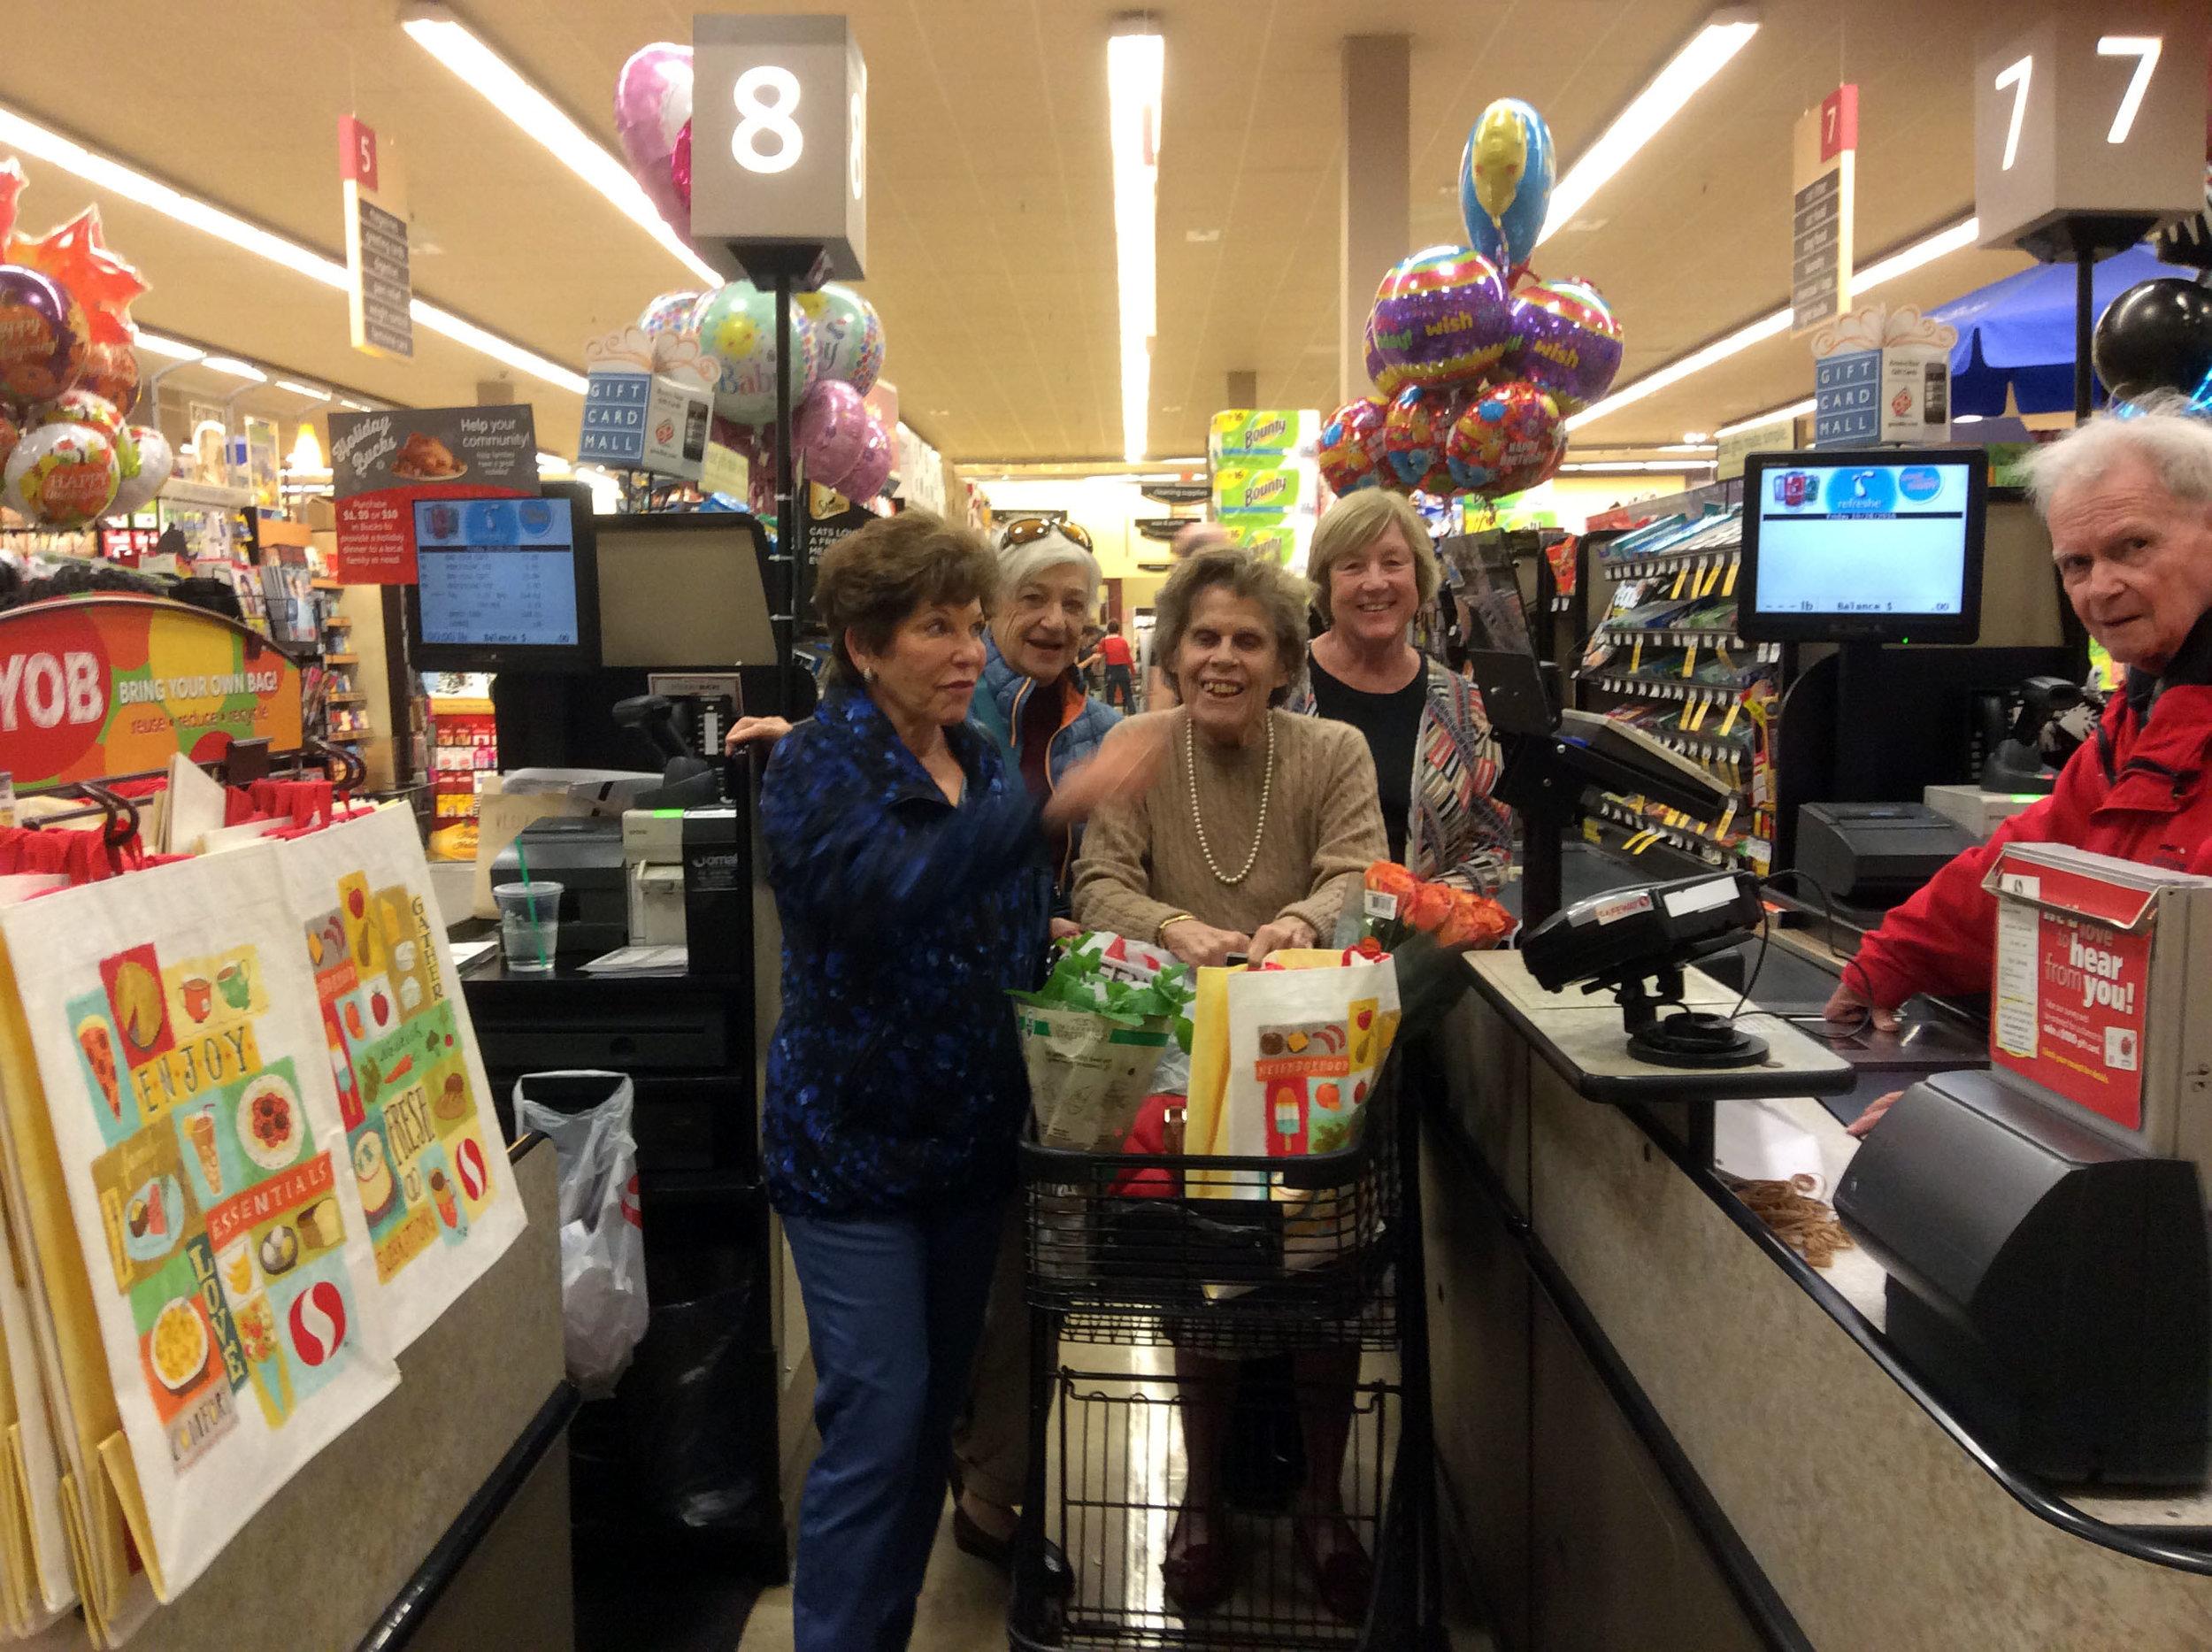 Normal   0           false   false   false     EN-US   X-NONE   X-NONE                                                                                                                                                                                                                                                                                                                                                                                                                                                                                                                                                                                                                                                                                                                                                                                                                                                          Bob, our favorite checker, greets longtime friends on Fridays at Safeway.